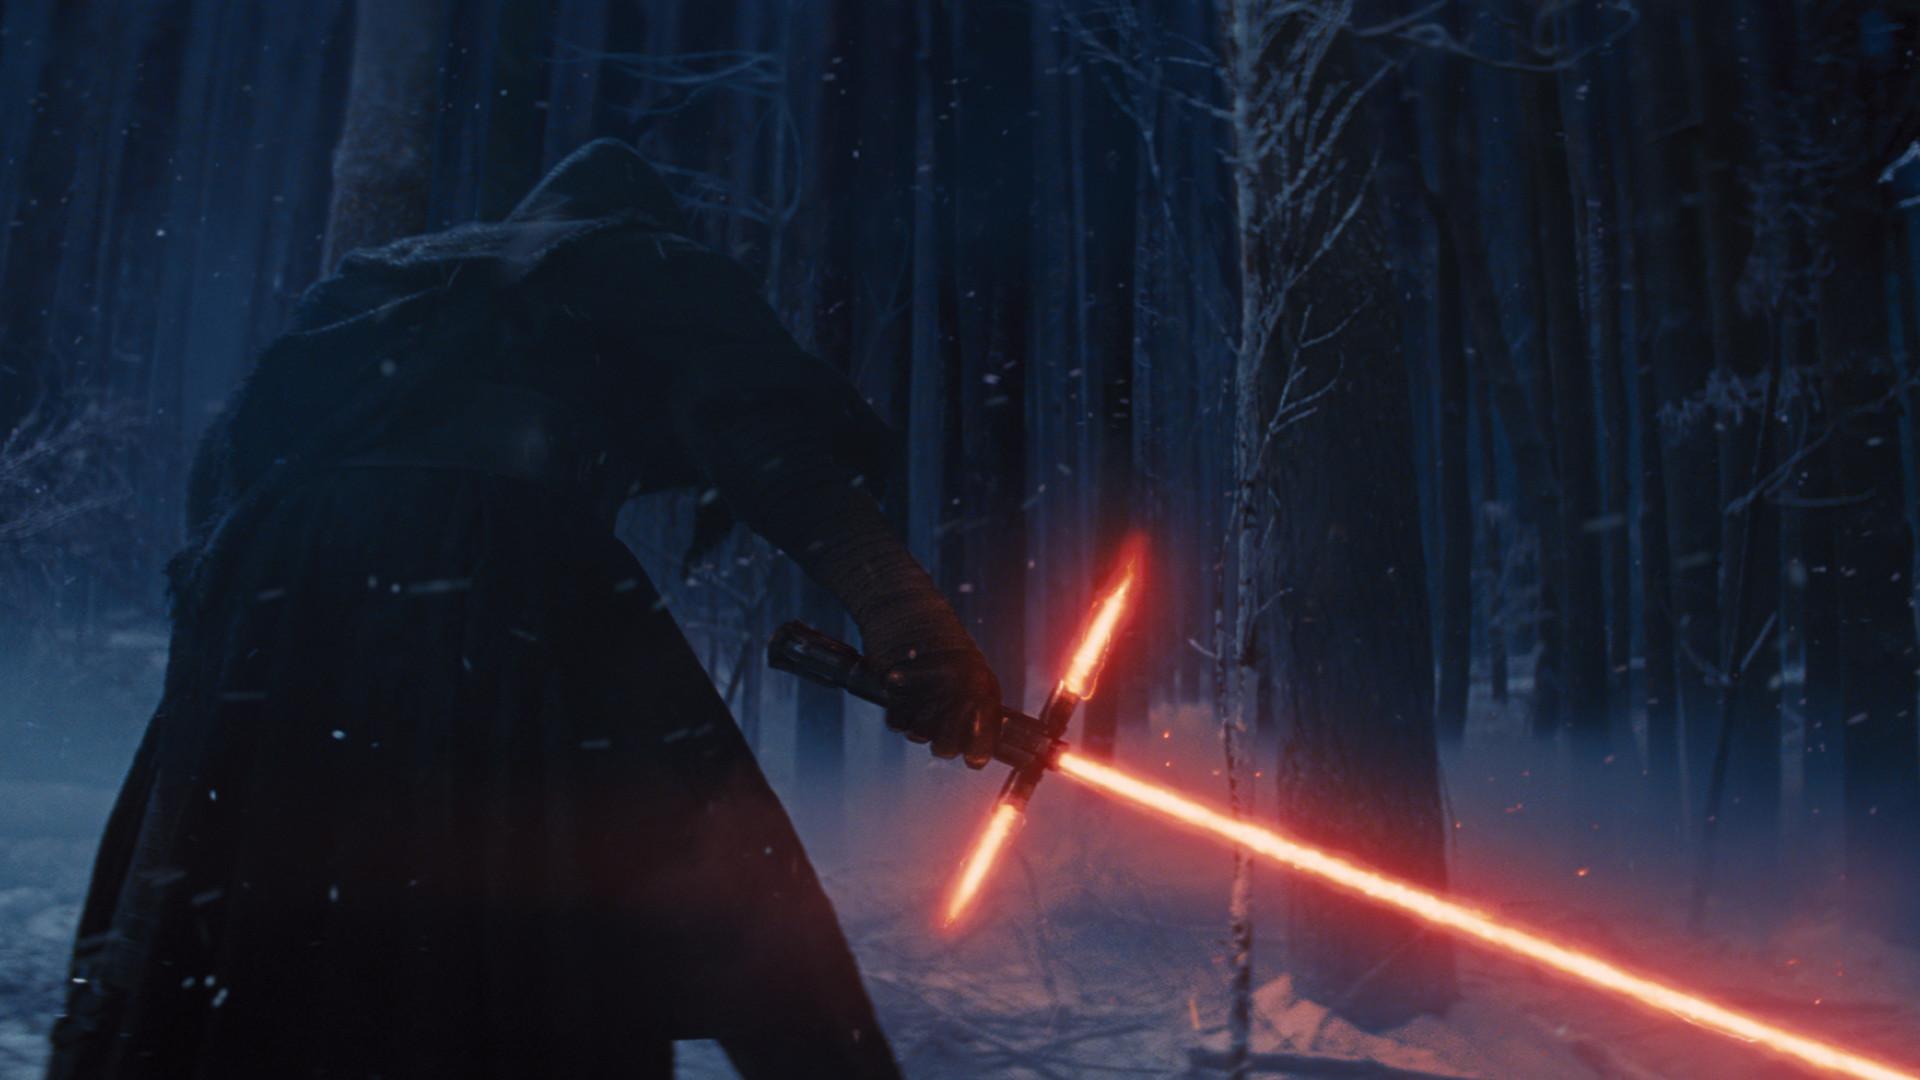 Movie – Star Wars Episode VII: The Force Awakens Star Wars Kylo Ren  Lightsaber Wallpaper